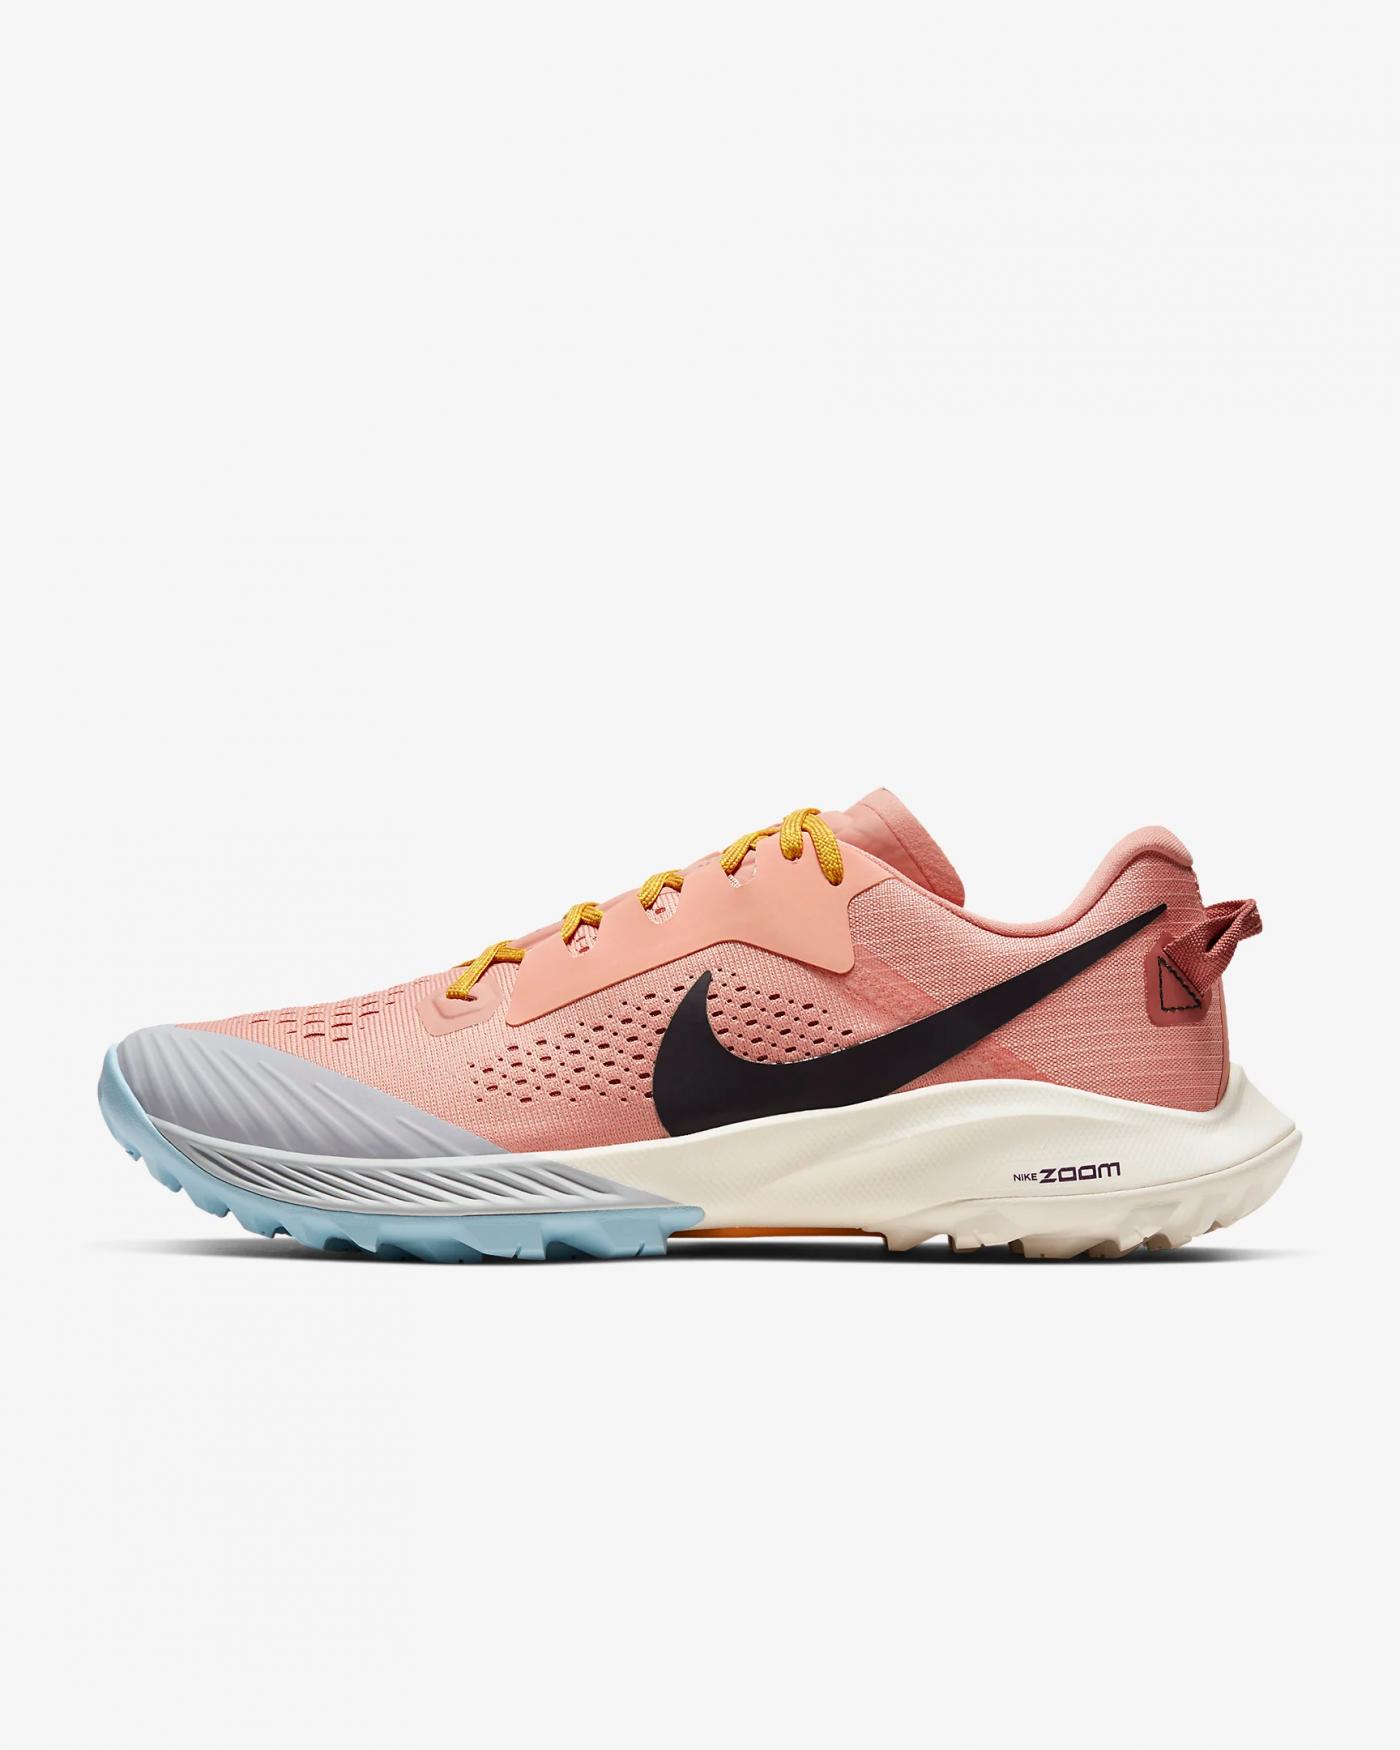 Nike-air-zoom-terra-kiger-6-trail-femme-1